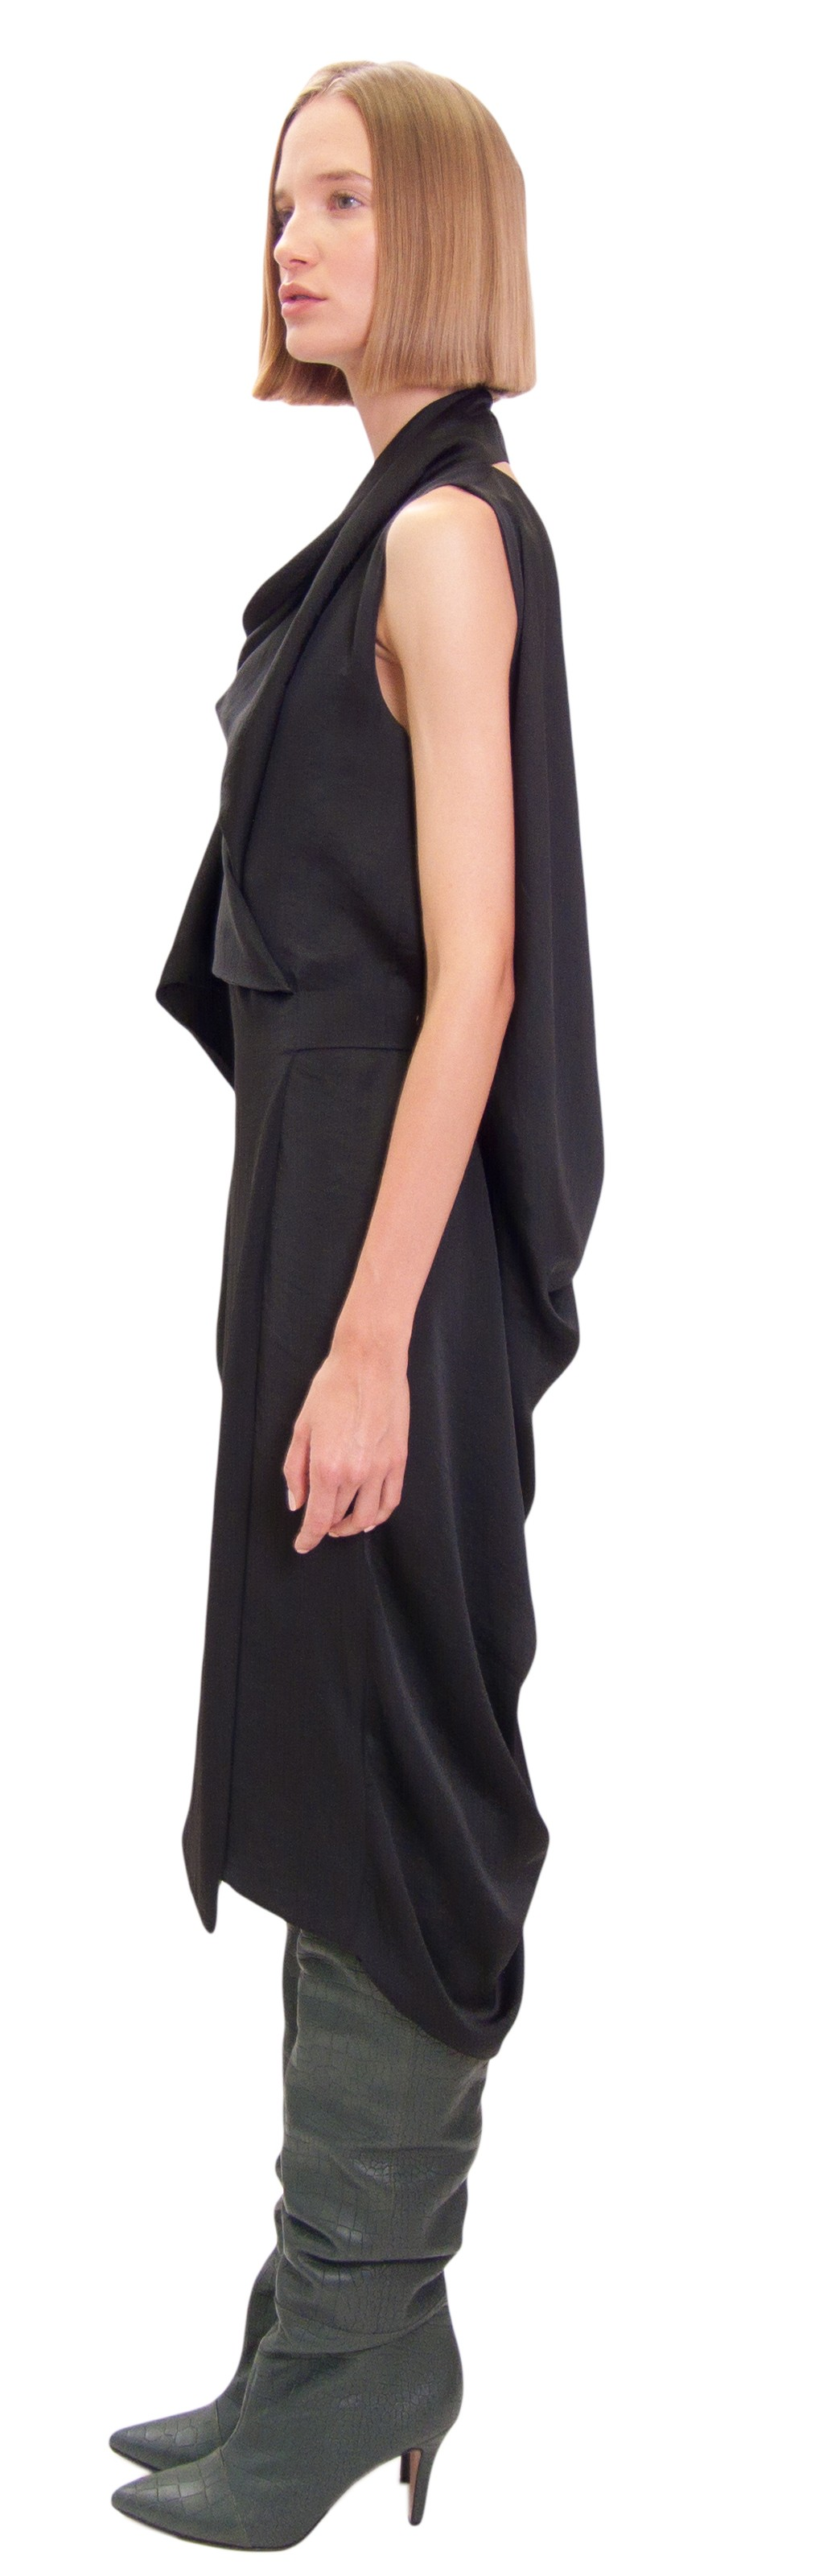 JSP SWAN DRESS